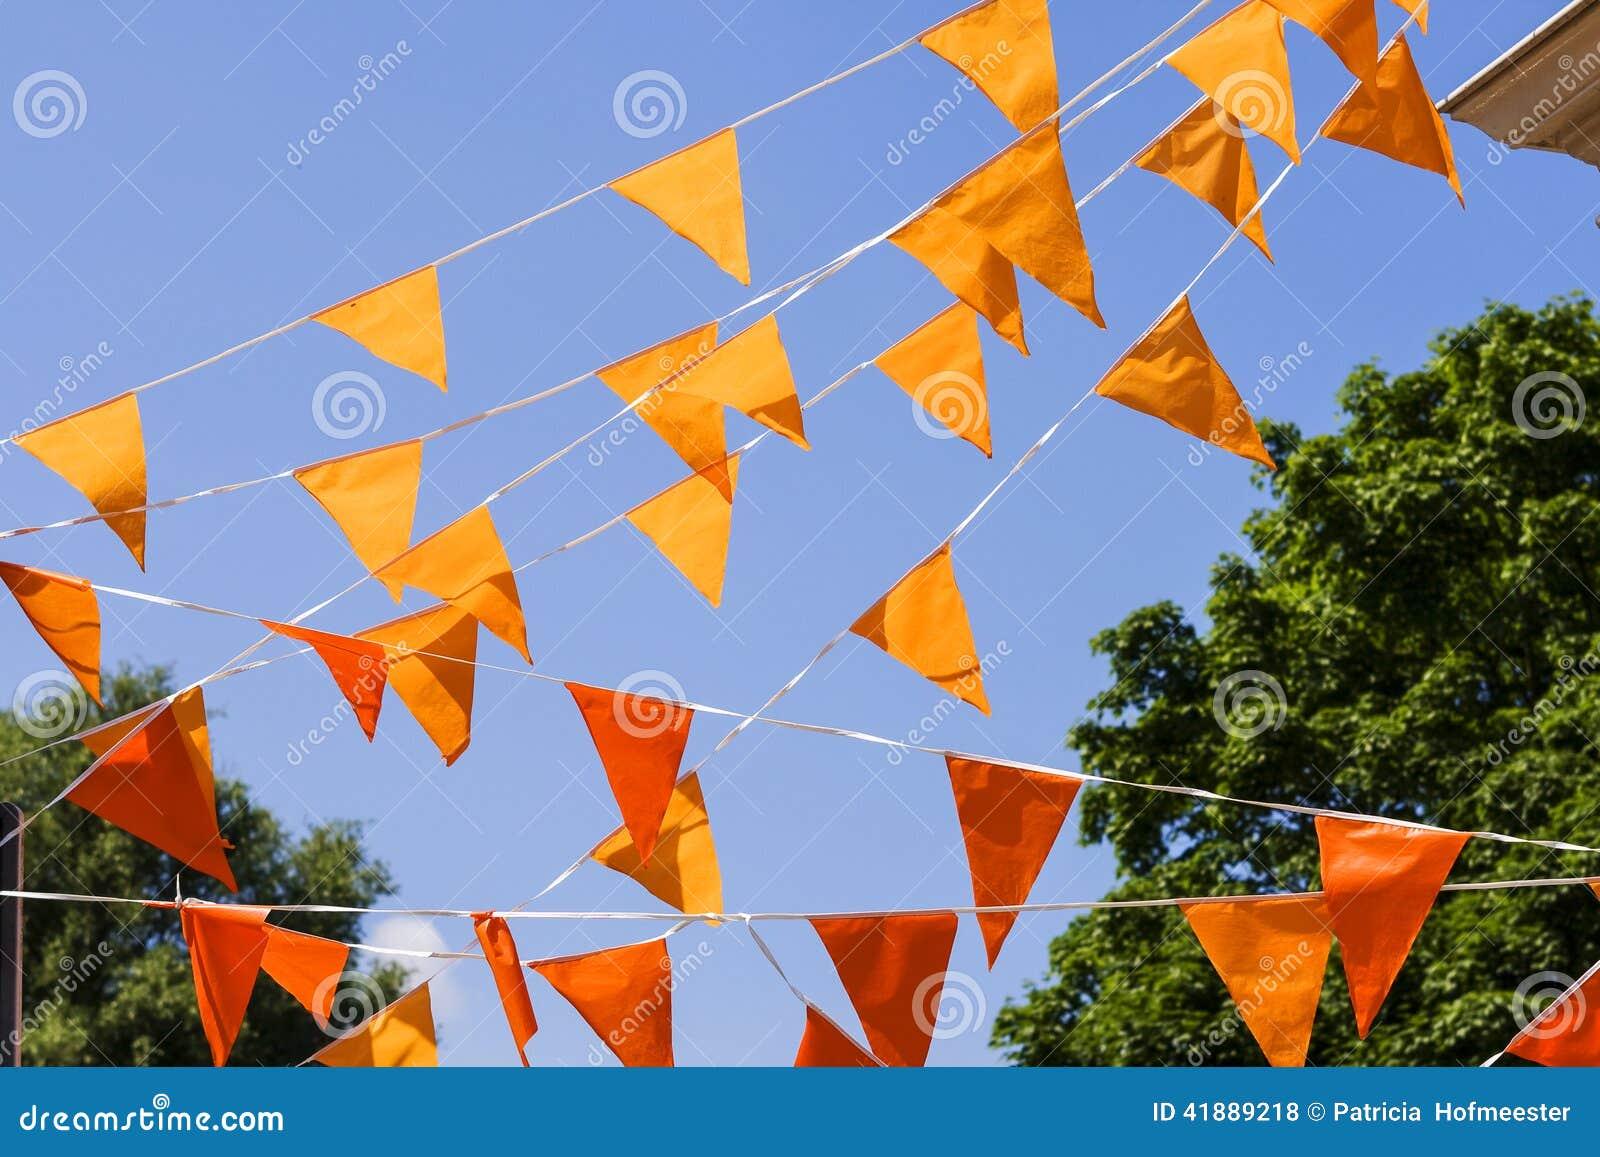 Bandeiras alaranjadas